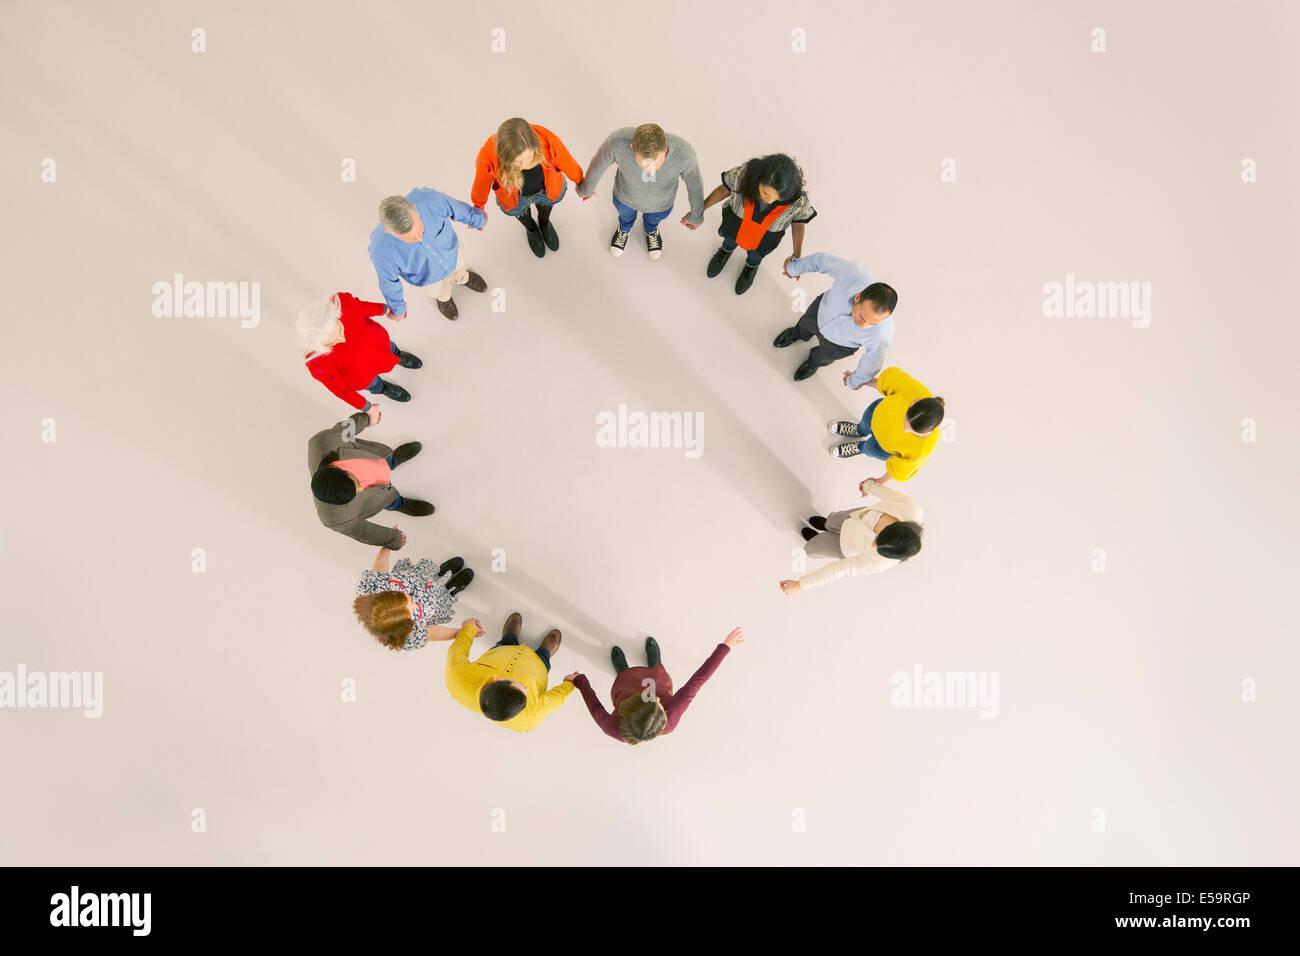 Diverse group forming circle - Stock Image